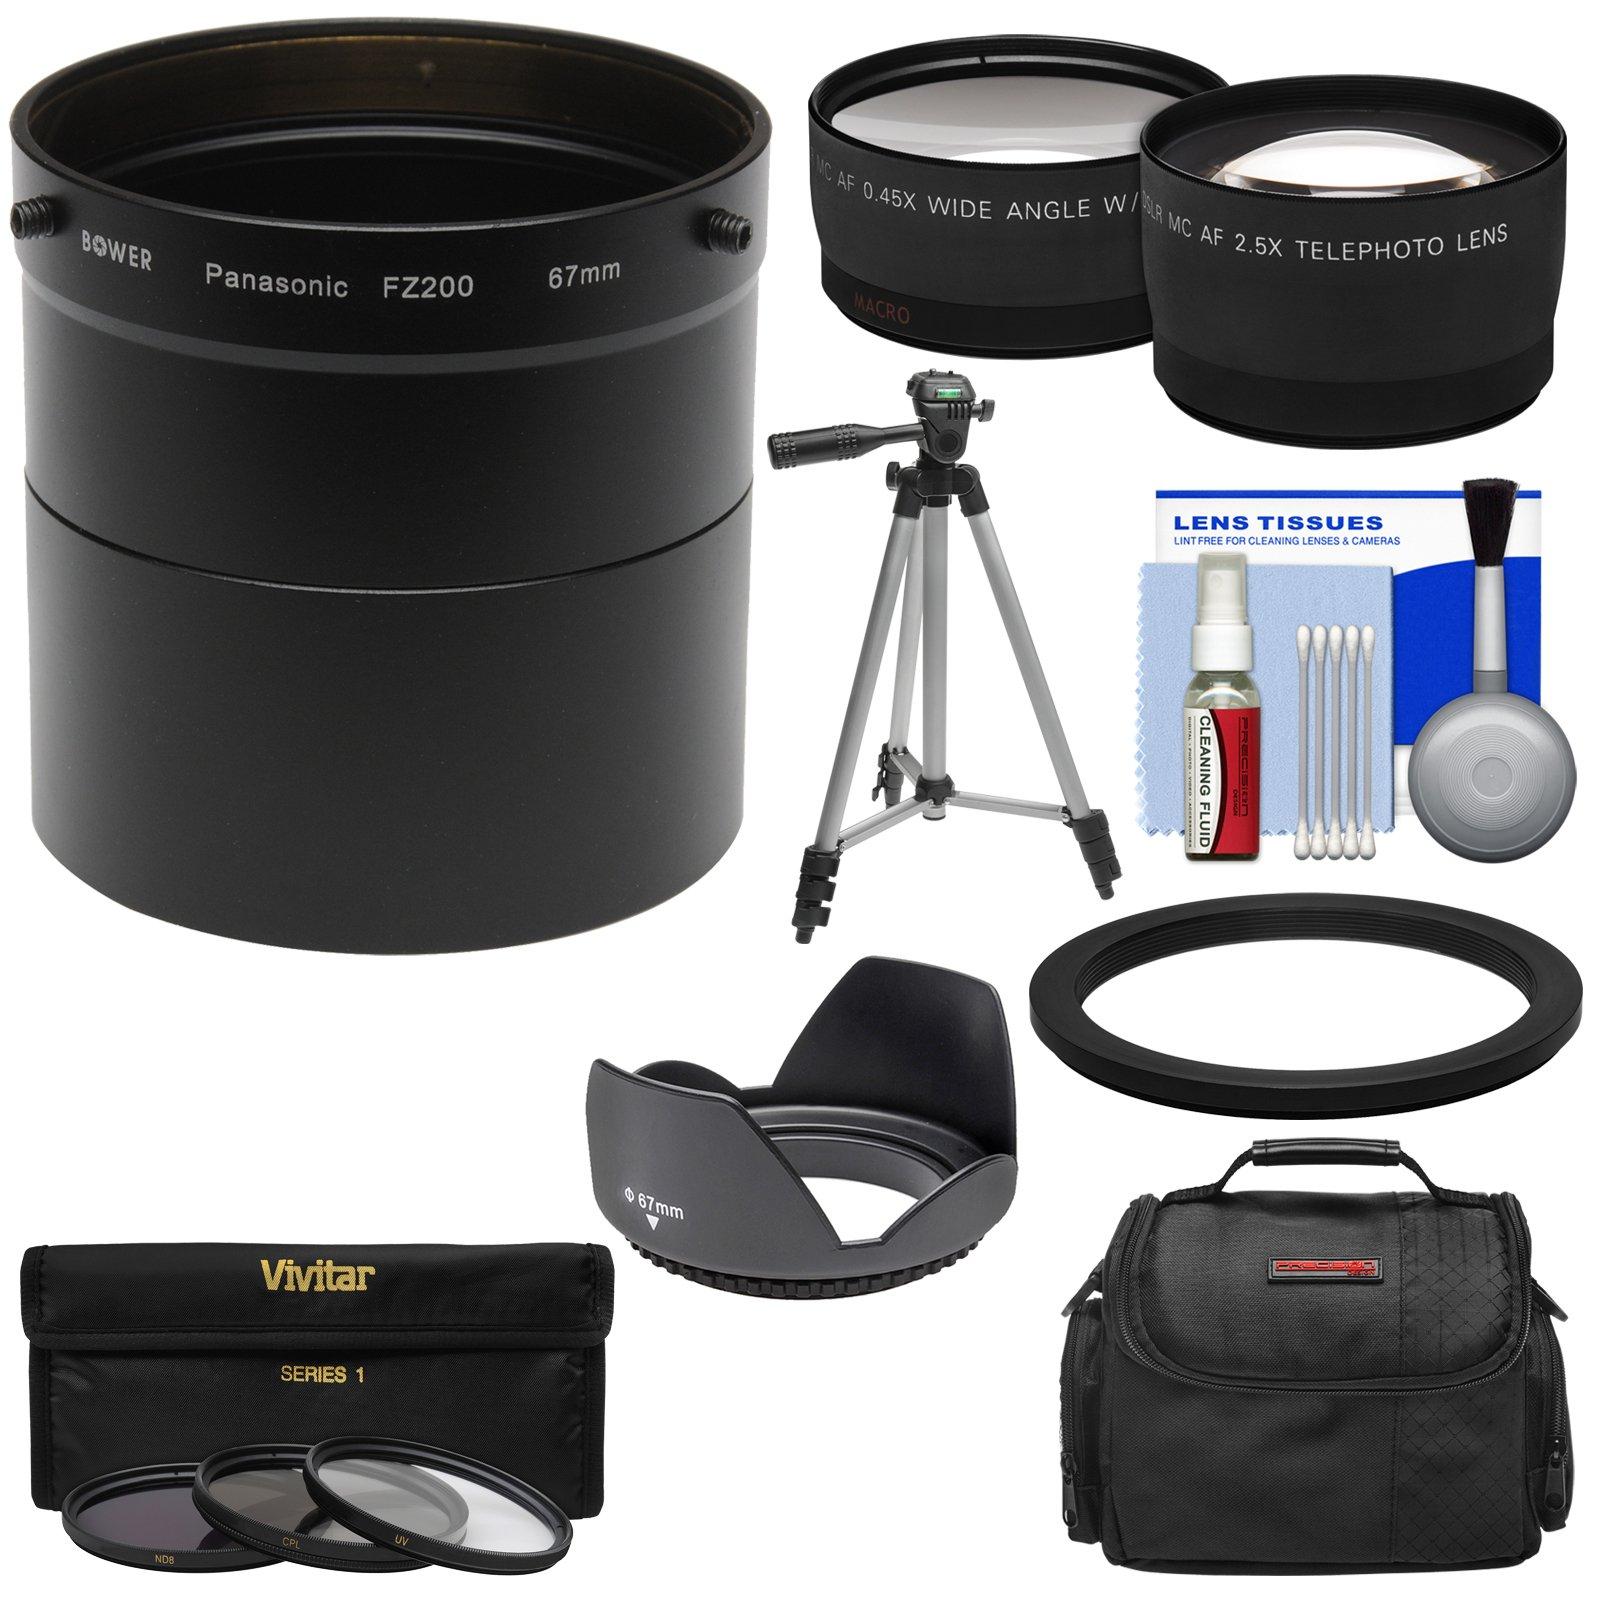 Panasonic Lumix DMC-FZ200 Digital Camera Essentials Bundle with Adapter Tube + 2.5x Tele & .45x Wide Angle Lenses + Hood + 3 Filters + Case + Tripod Kit